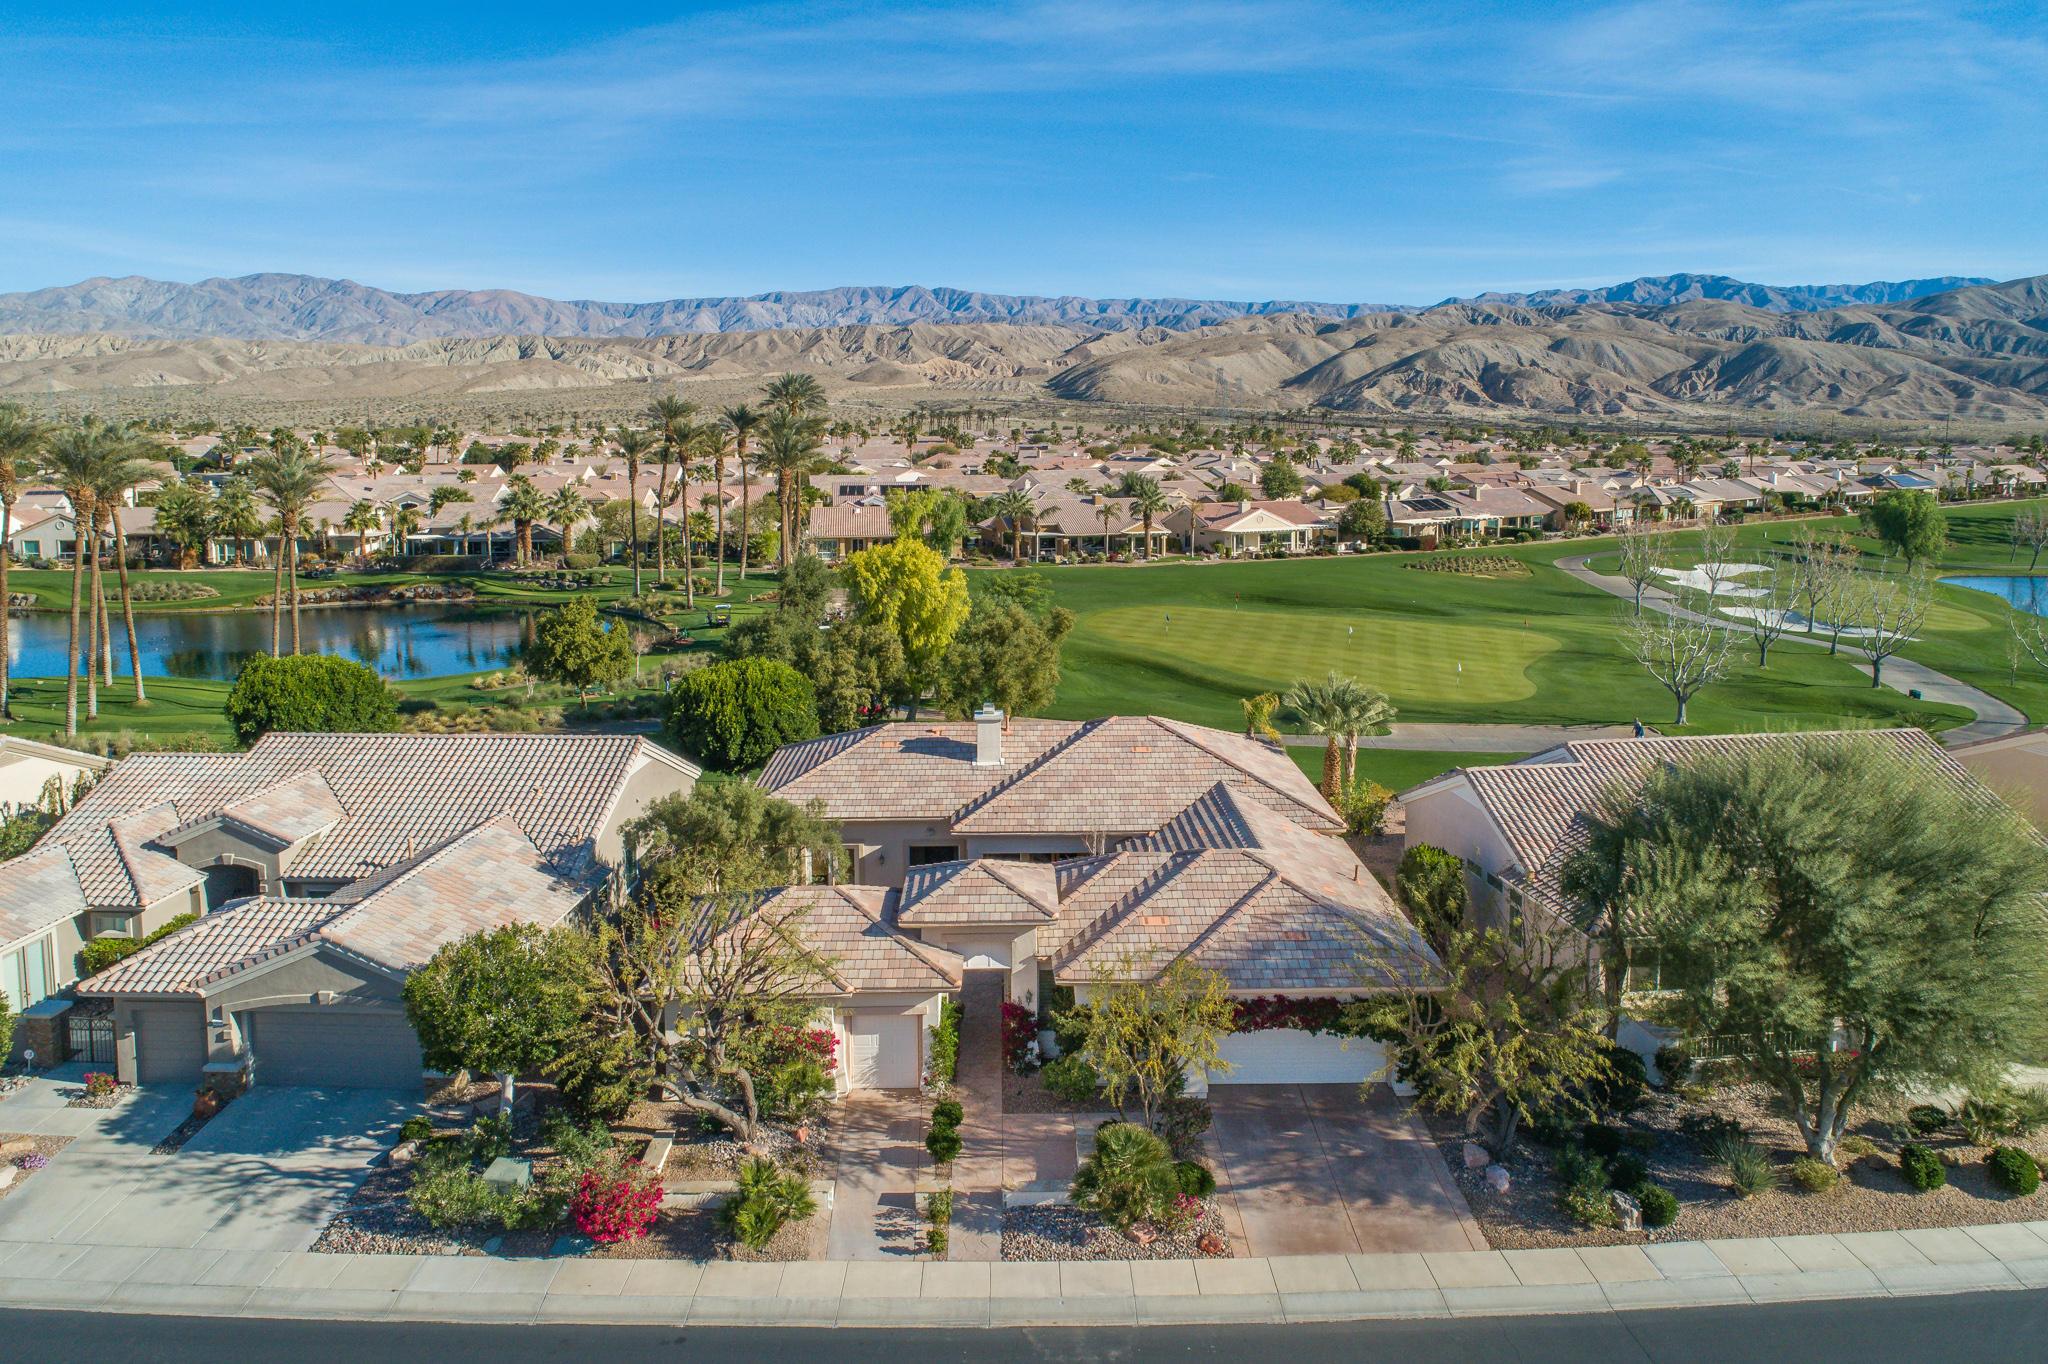 Photo of 78532 Valley Vista Avenue, Palm Desert, CA 92211